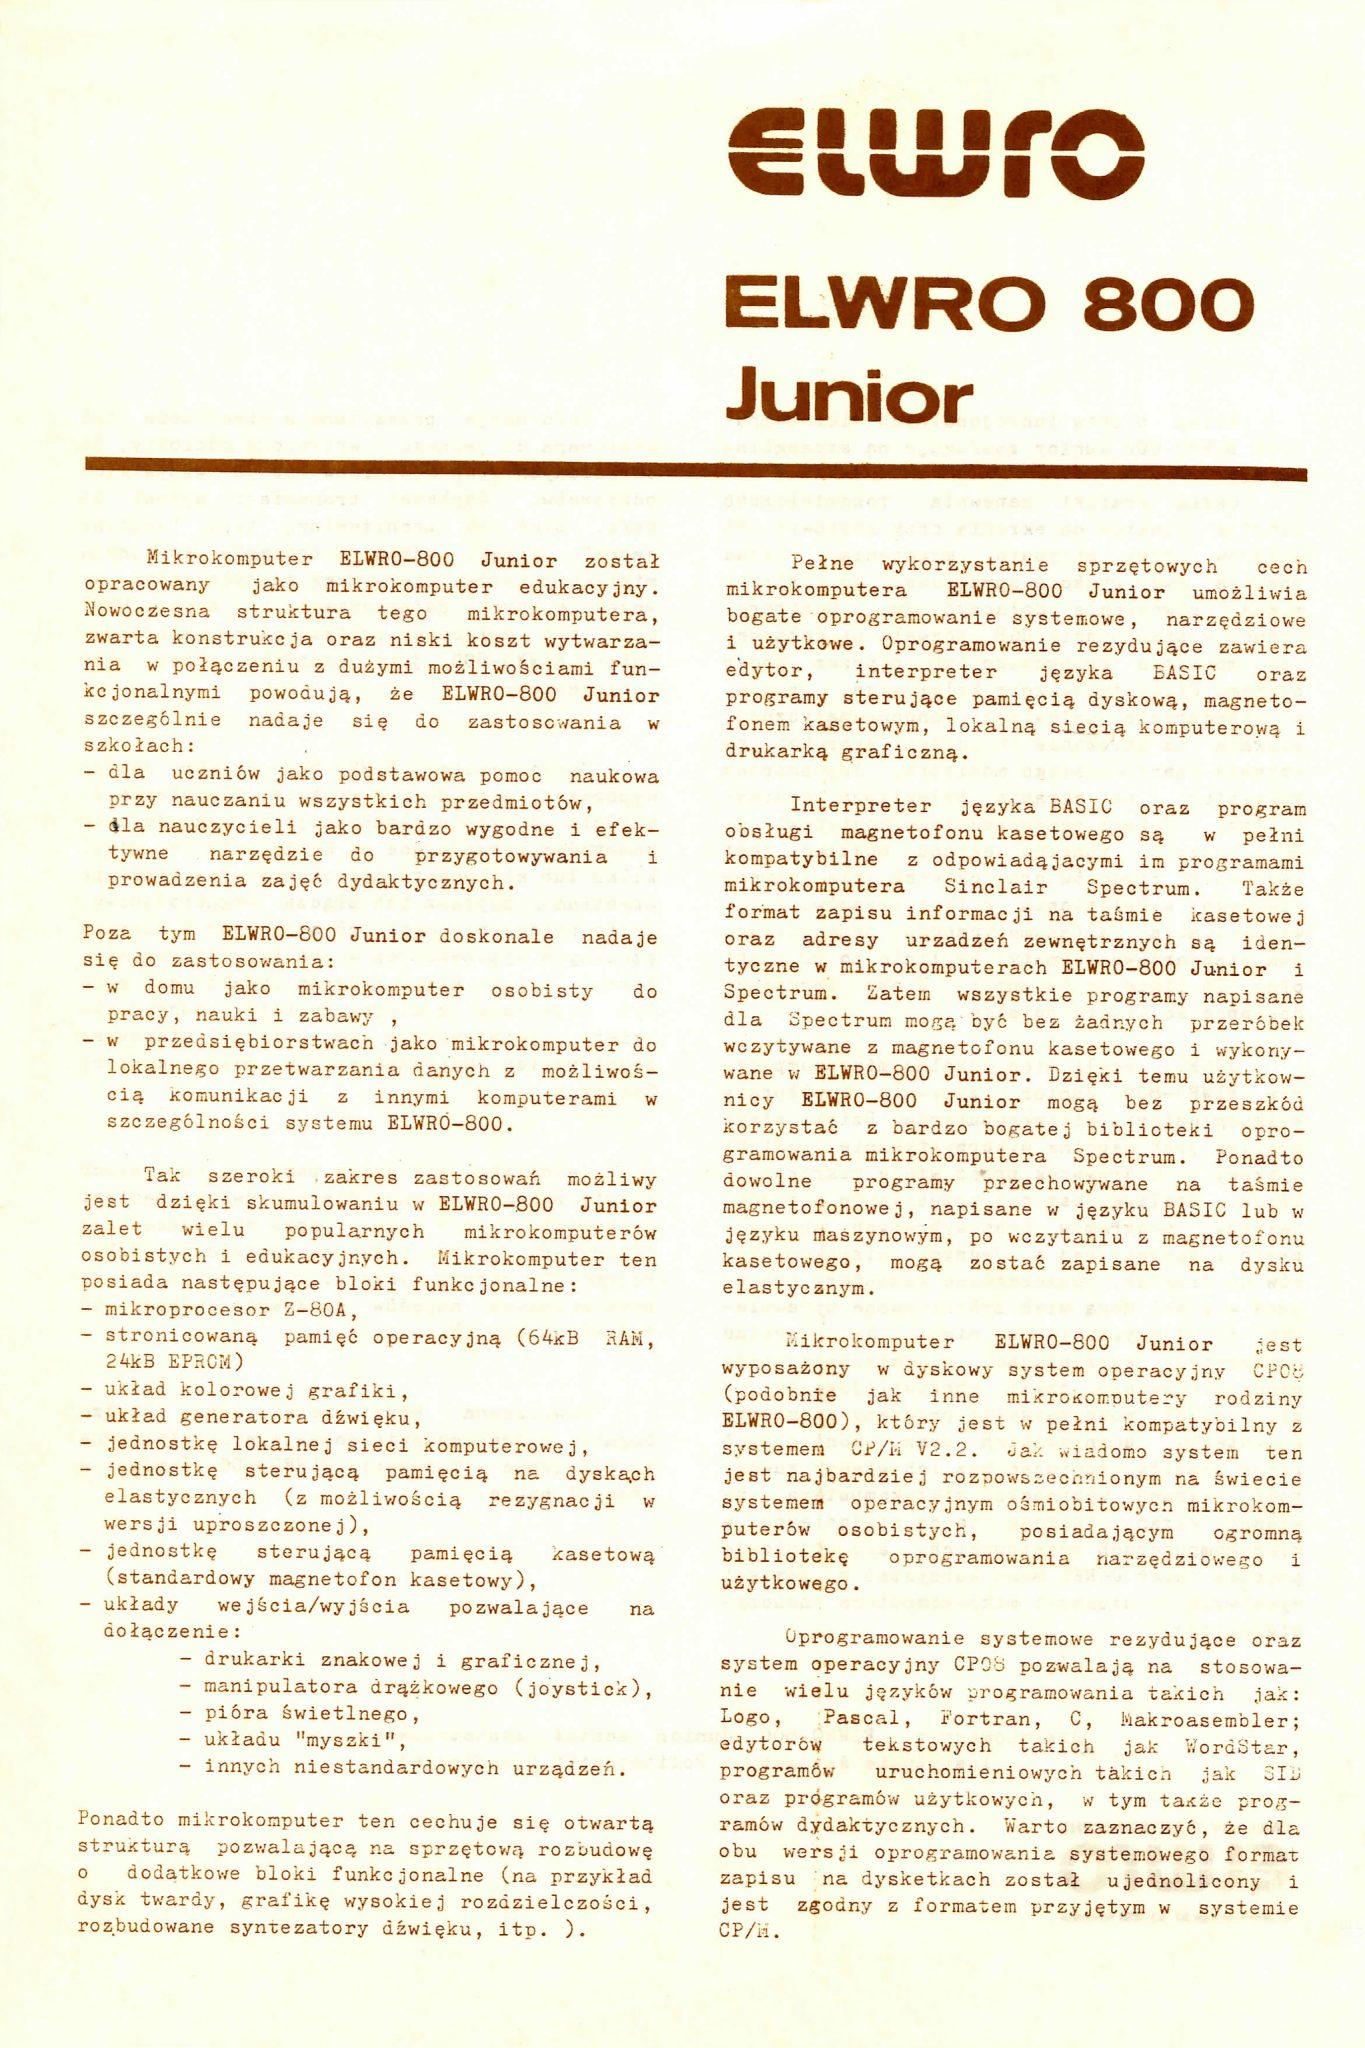 Prospekt ELWRO 800 Junior Awers